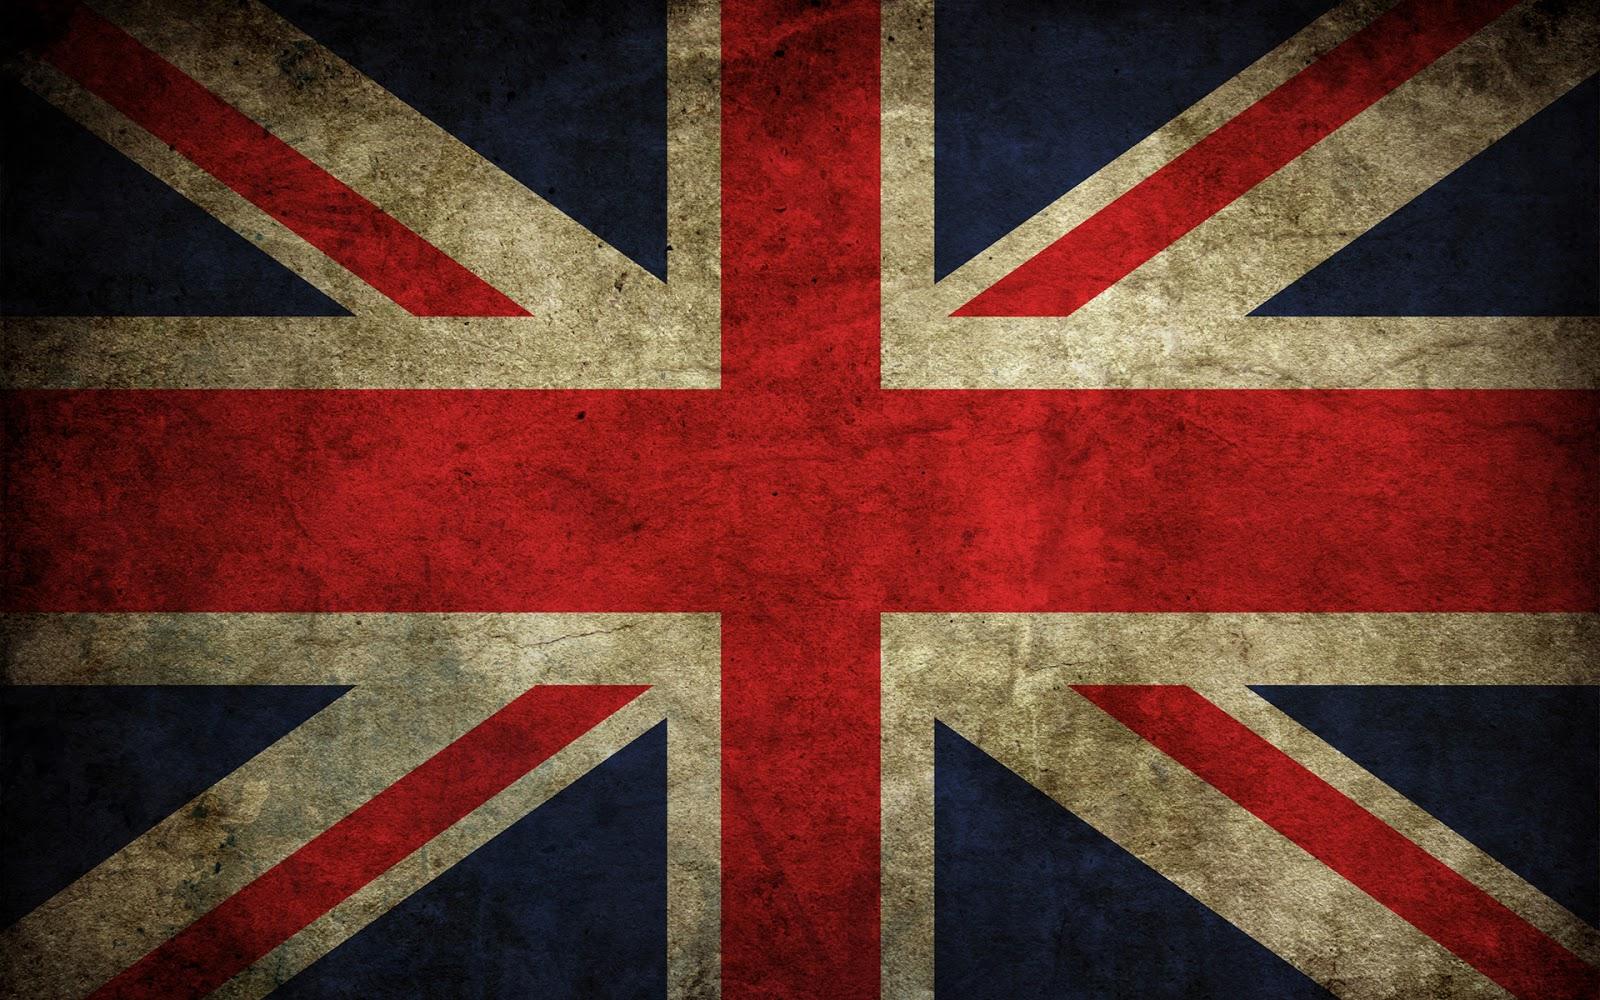 https://2.bp.blogspot.com/-EK6JqeBuHSg/TcG3srsvwvI/AAAAAAAAAe8/4IzVlcIG4ZA/s1600/British%20Flag%20Wallpapers.jpg